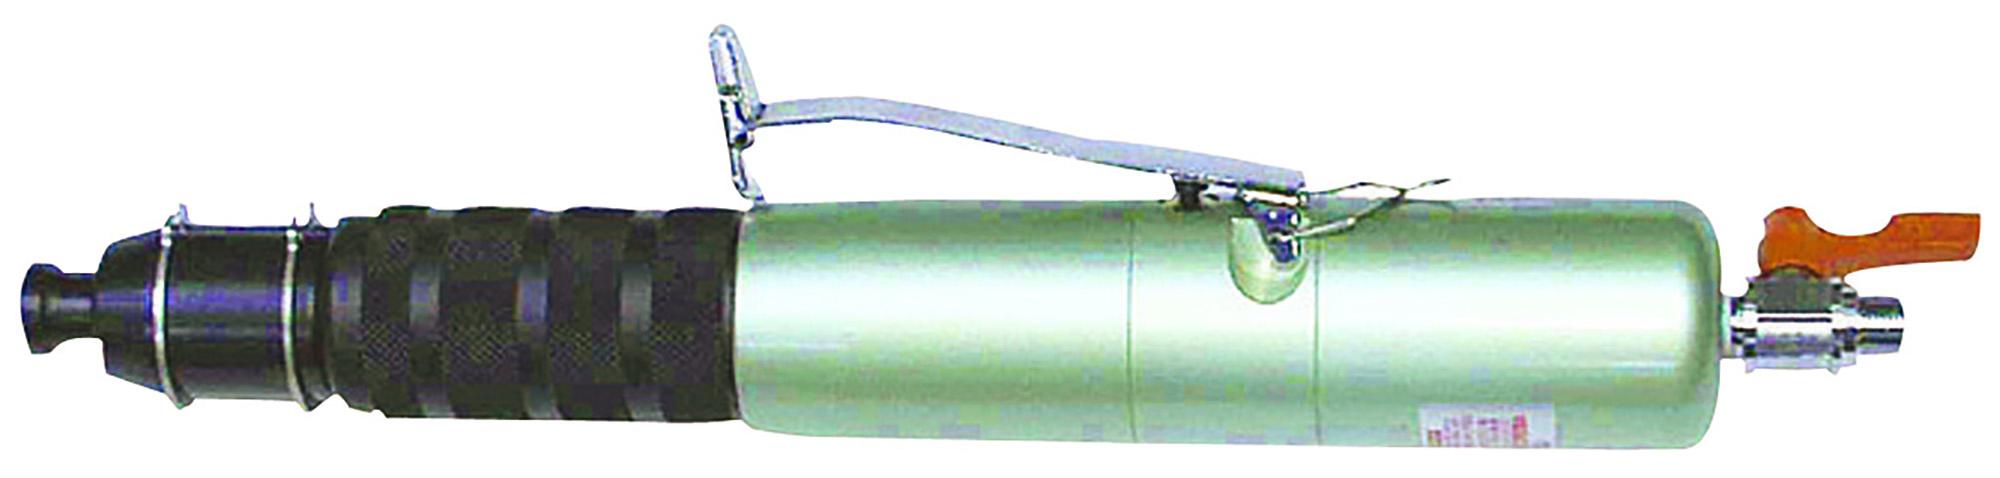 RH90 ショットハンマ 標準リベットスナップ付